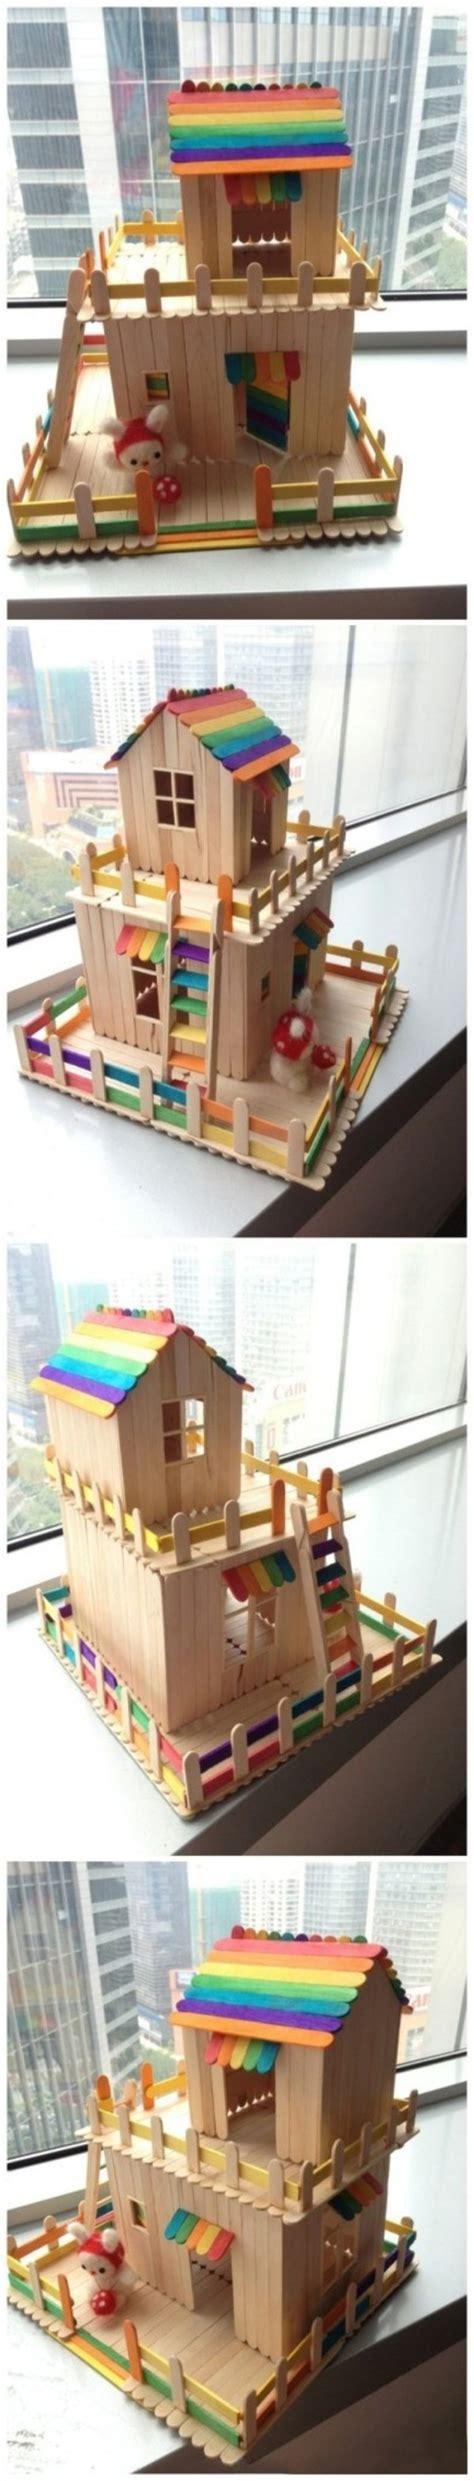 home decor sticks diy popsicle sticks home decor ideas that you will